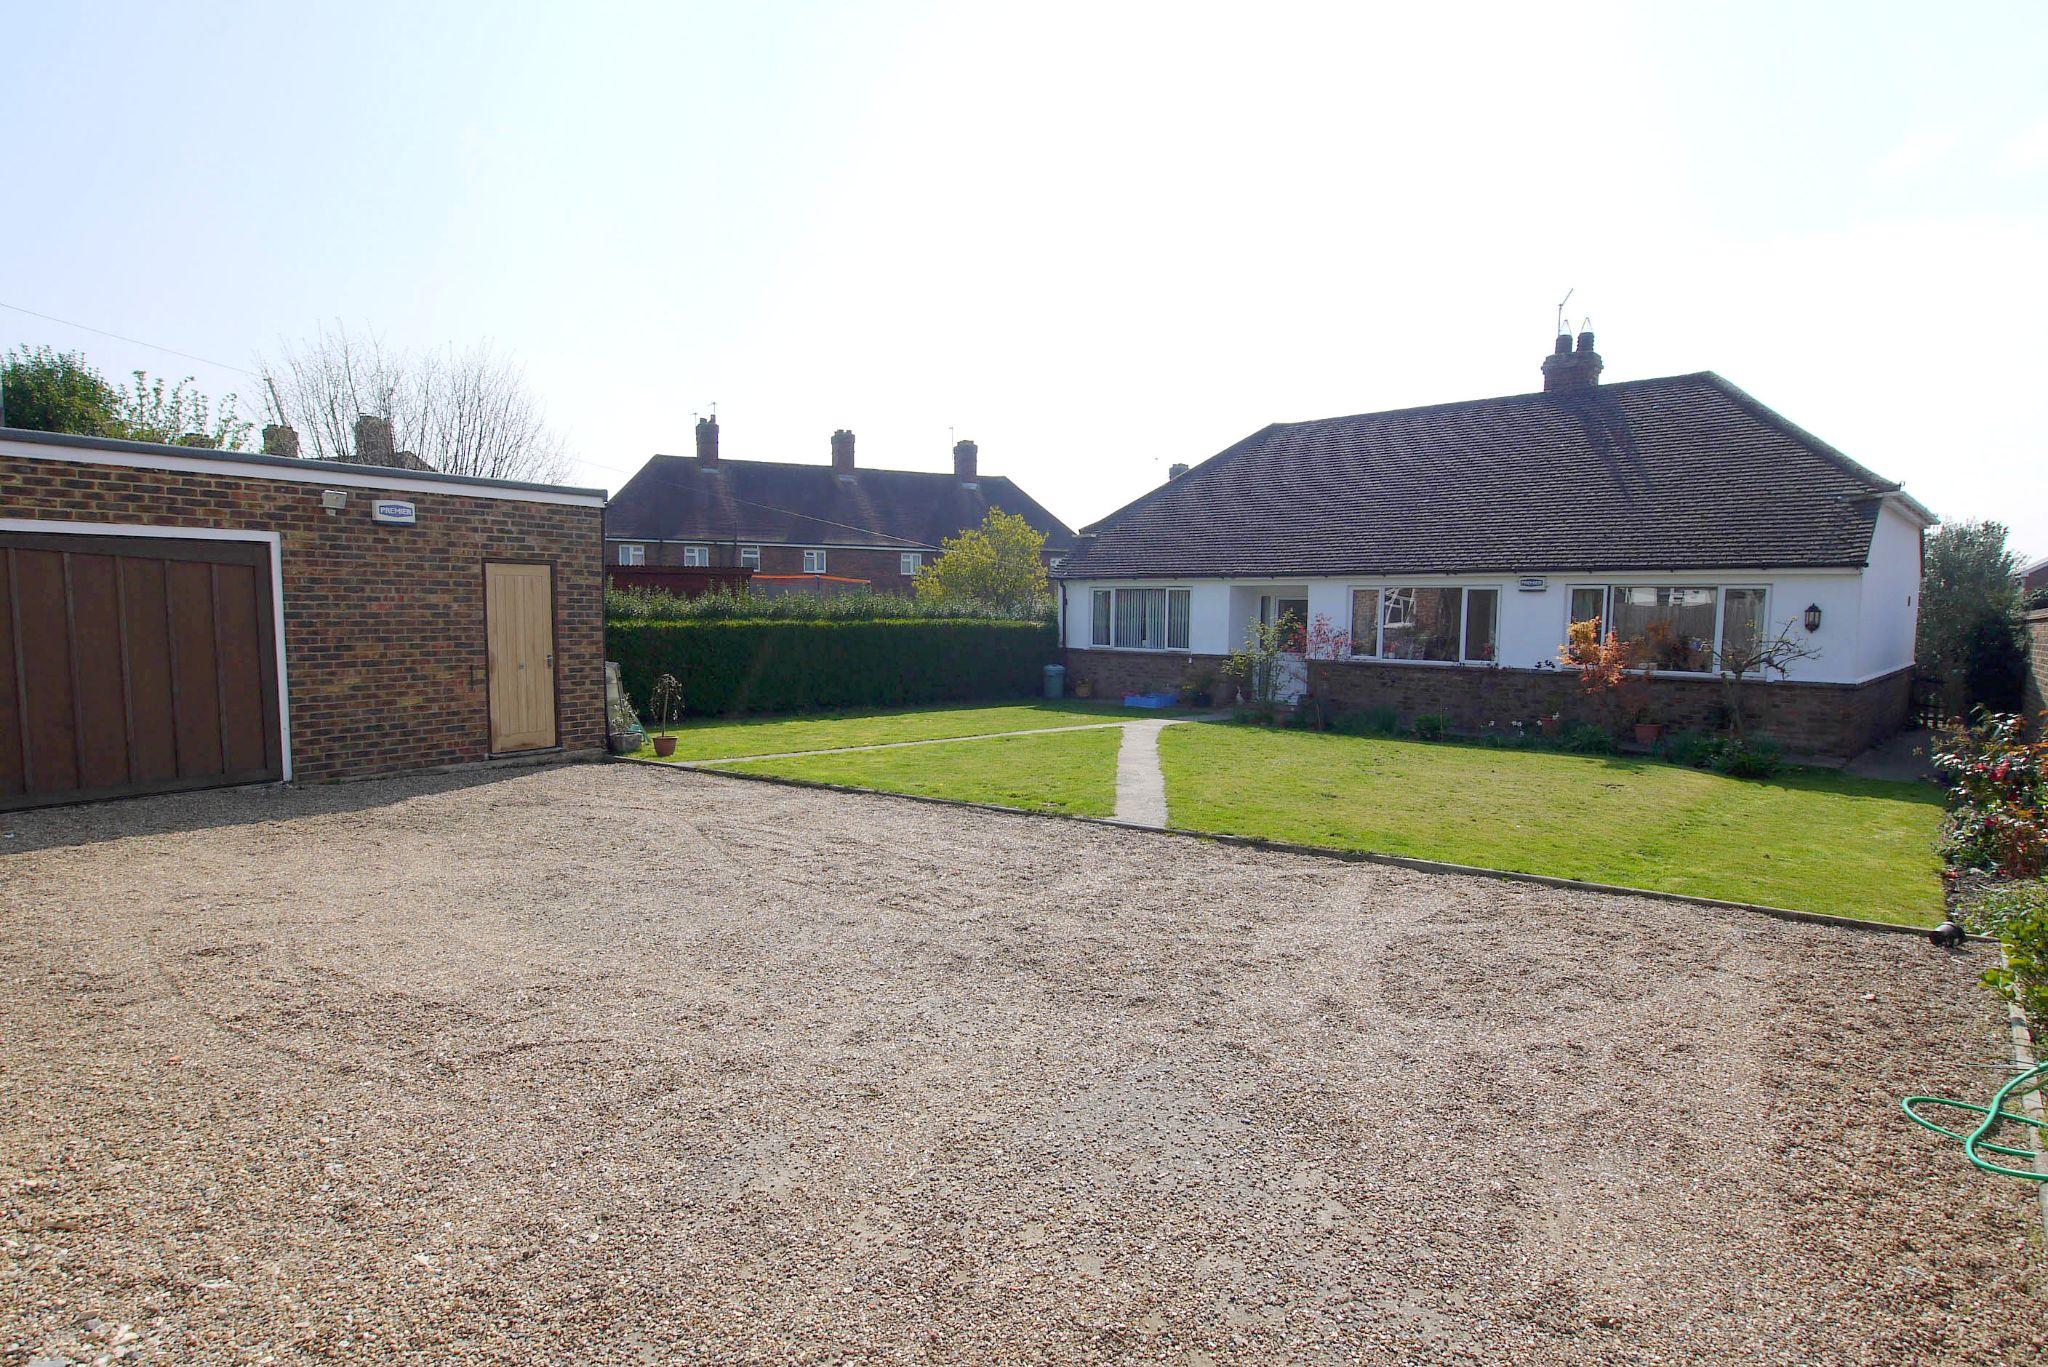 2 bedroom detached bungalow For Sale in Sevenoaks - Photograph 1